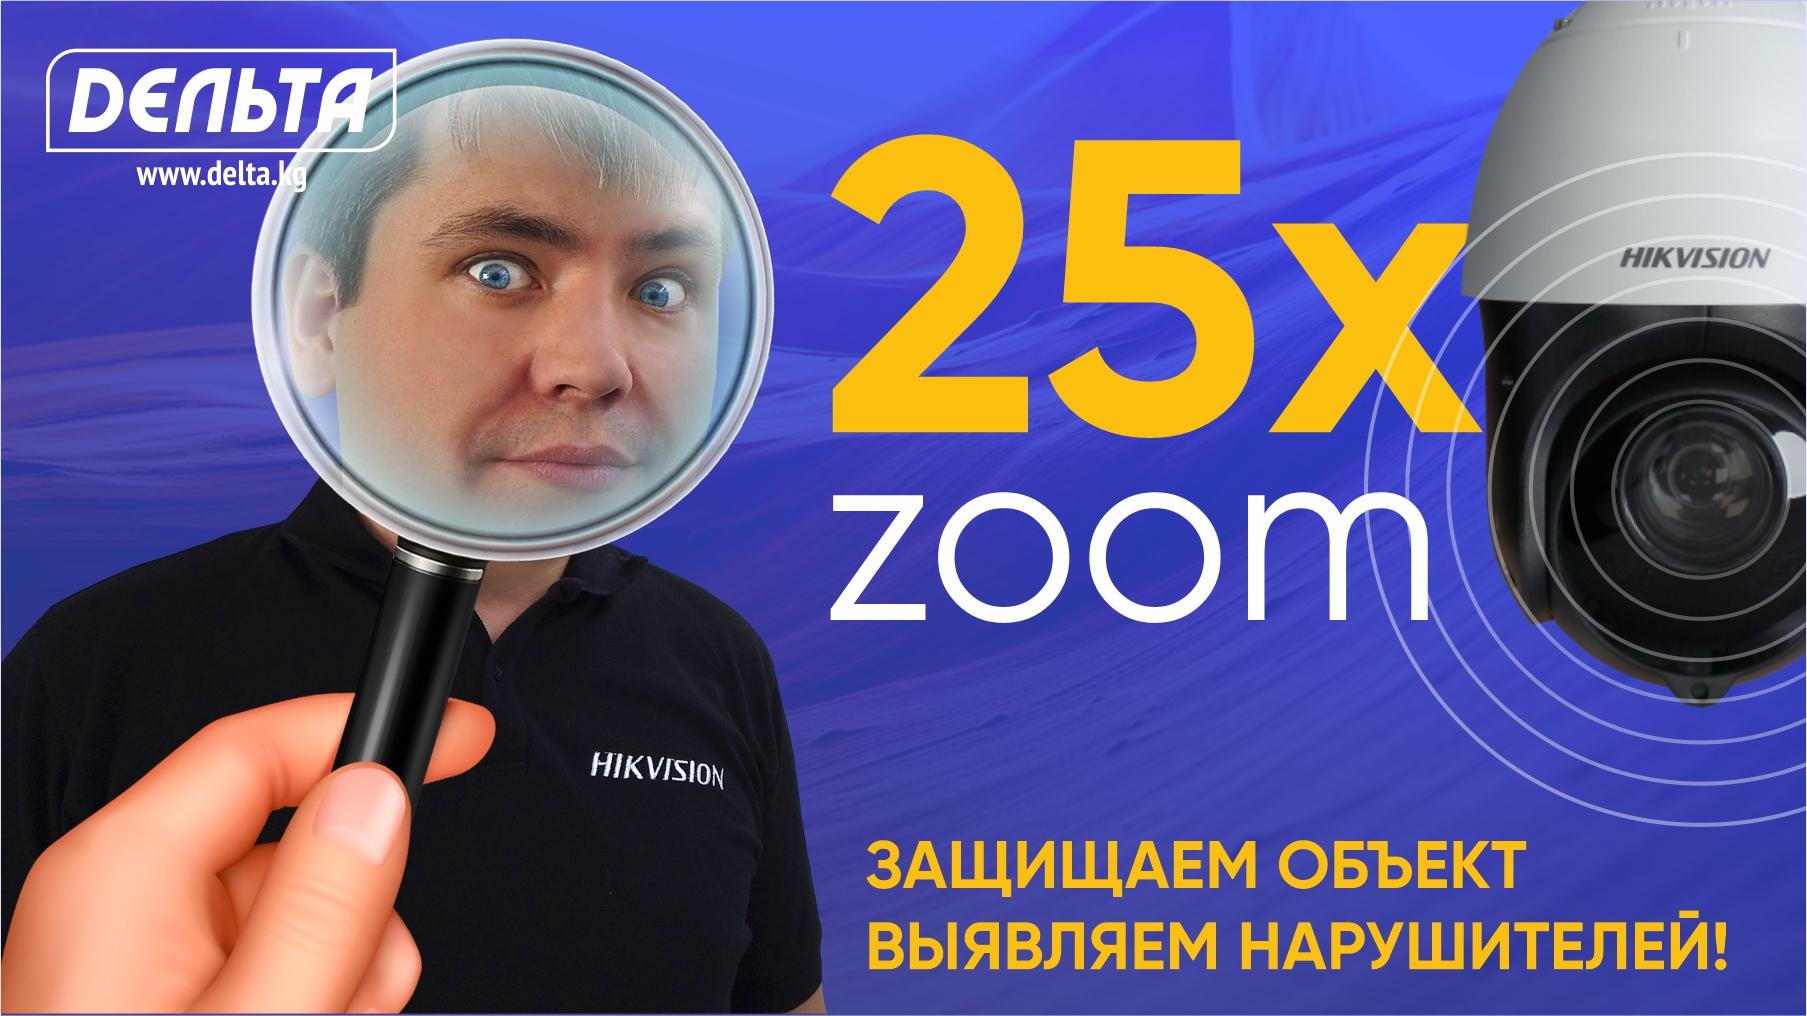 25-ти кратный зум, FULL HD разрешение!